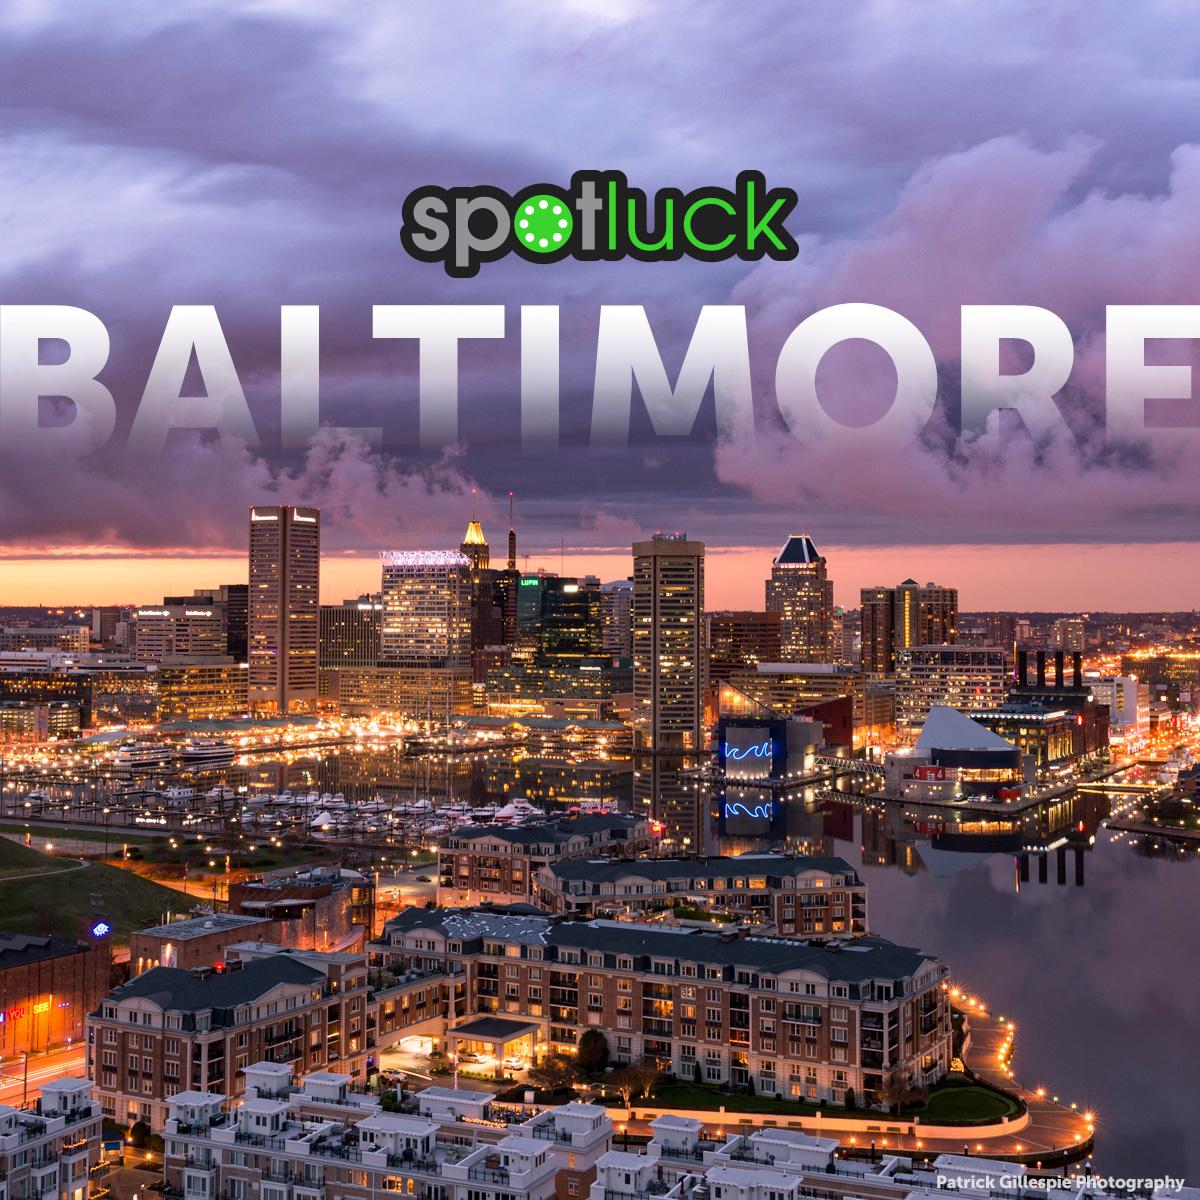 Spotluck-Baltimore-Launch-Image